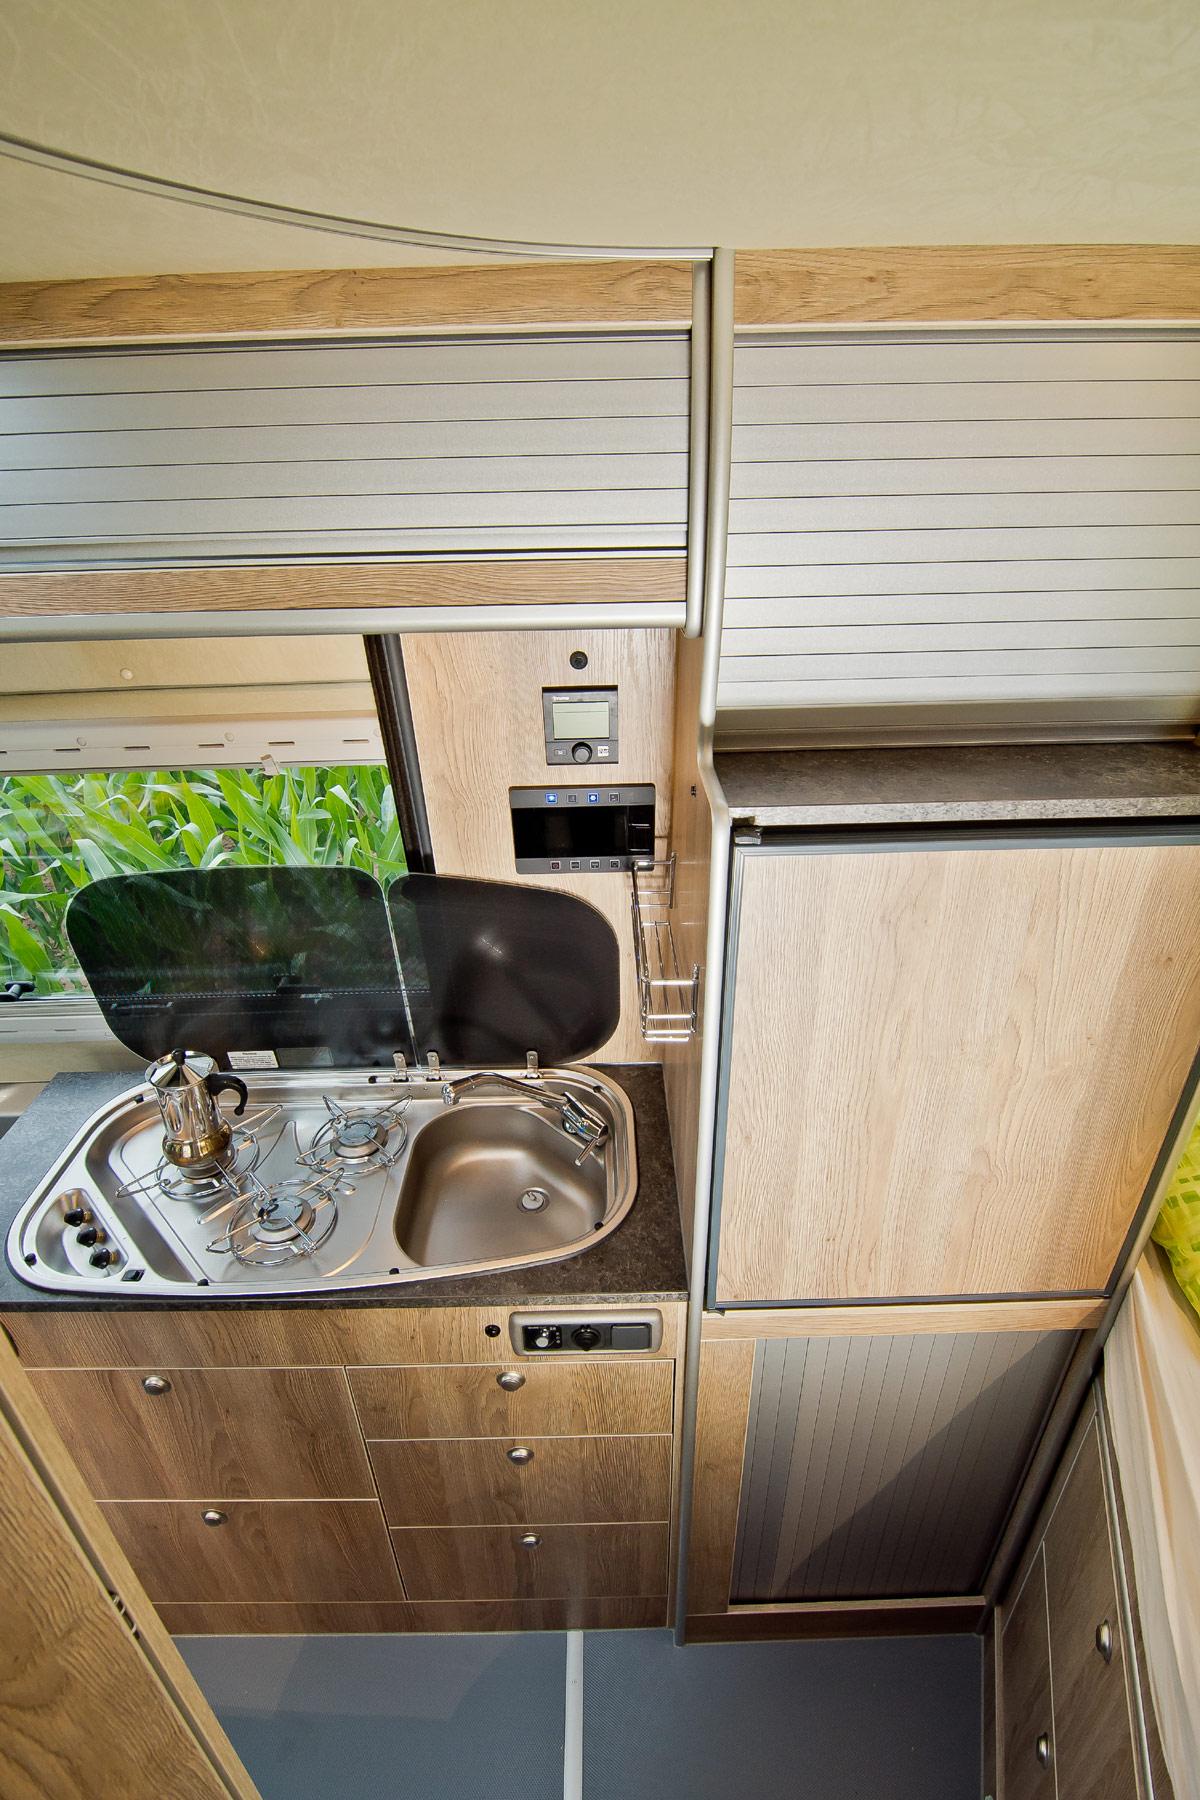 La Strada Regent S, Campingplatz, nein Danke! La Strada Regent S auf Mercedes Sprinter 4×4